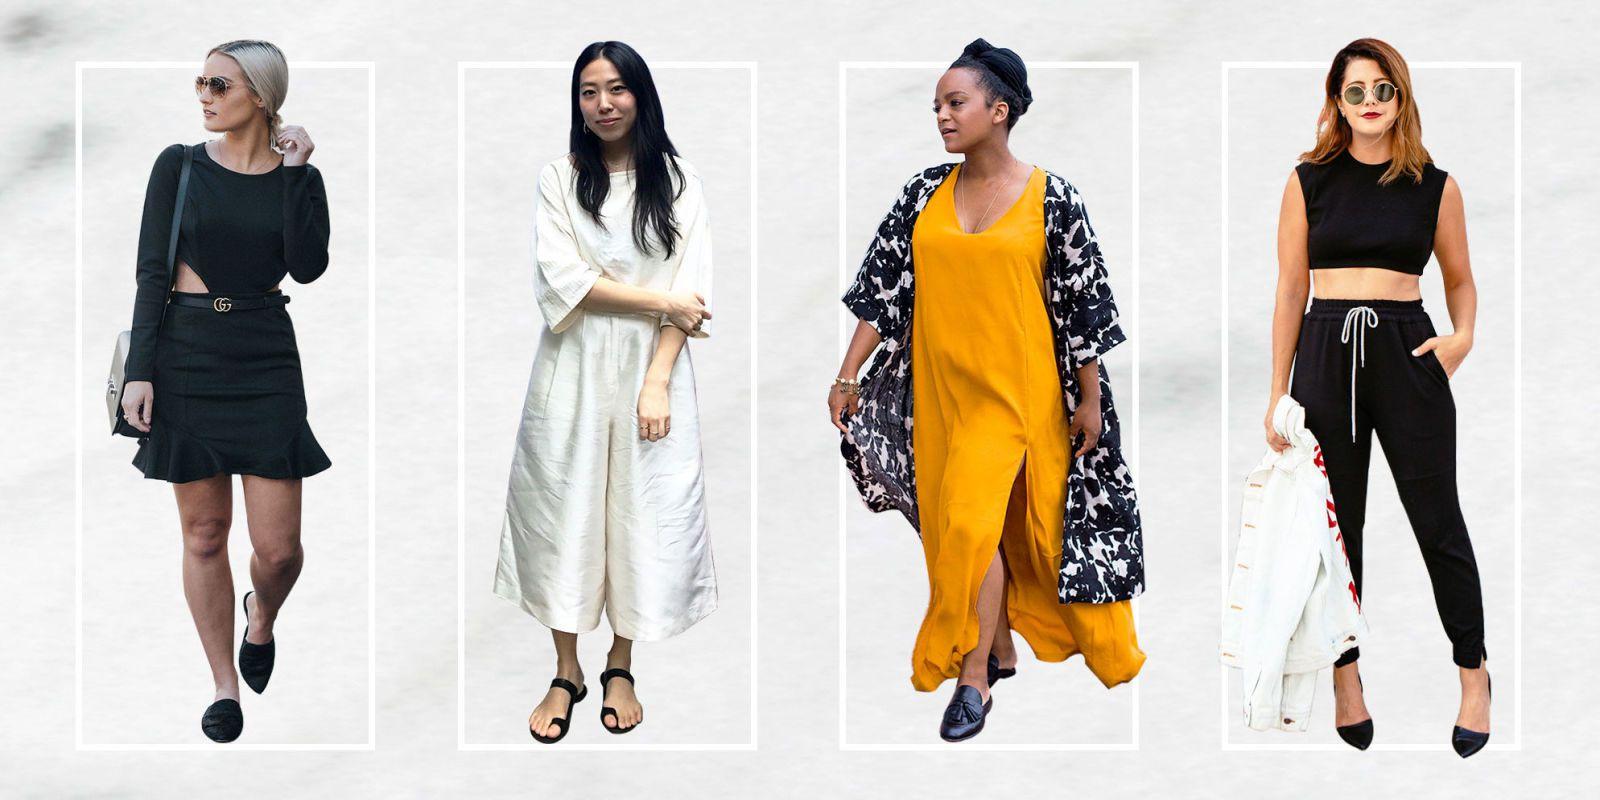 fashion clothing personal style EICYJQL